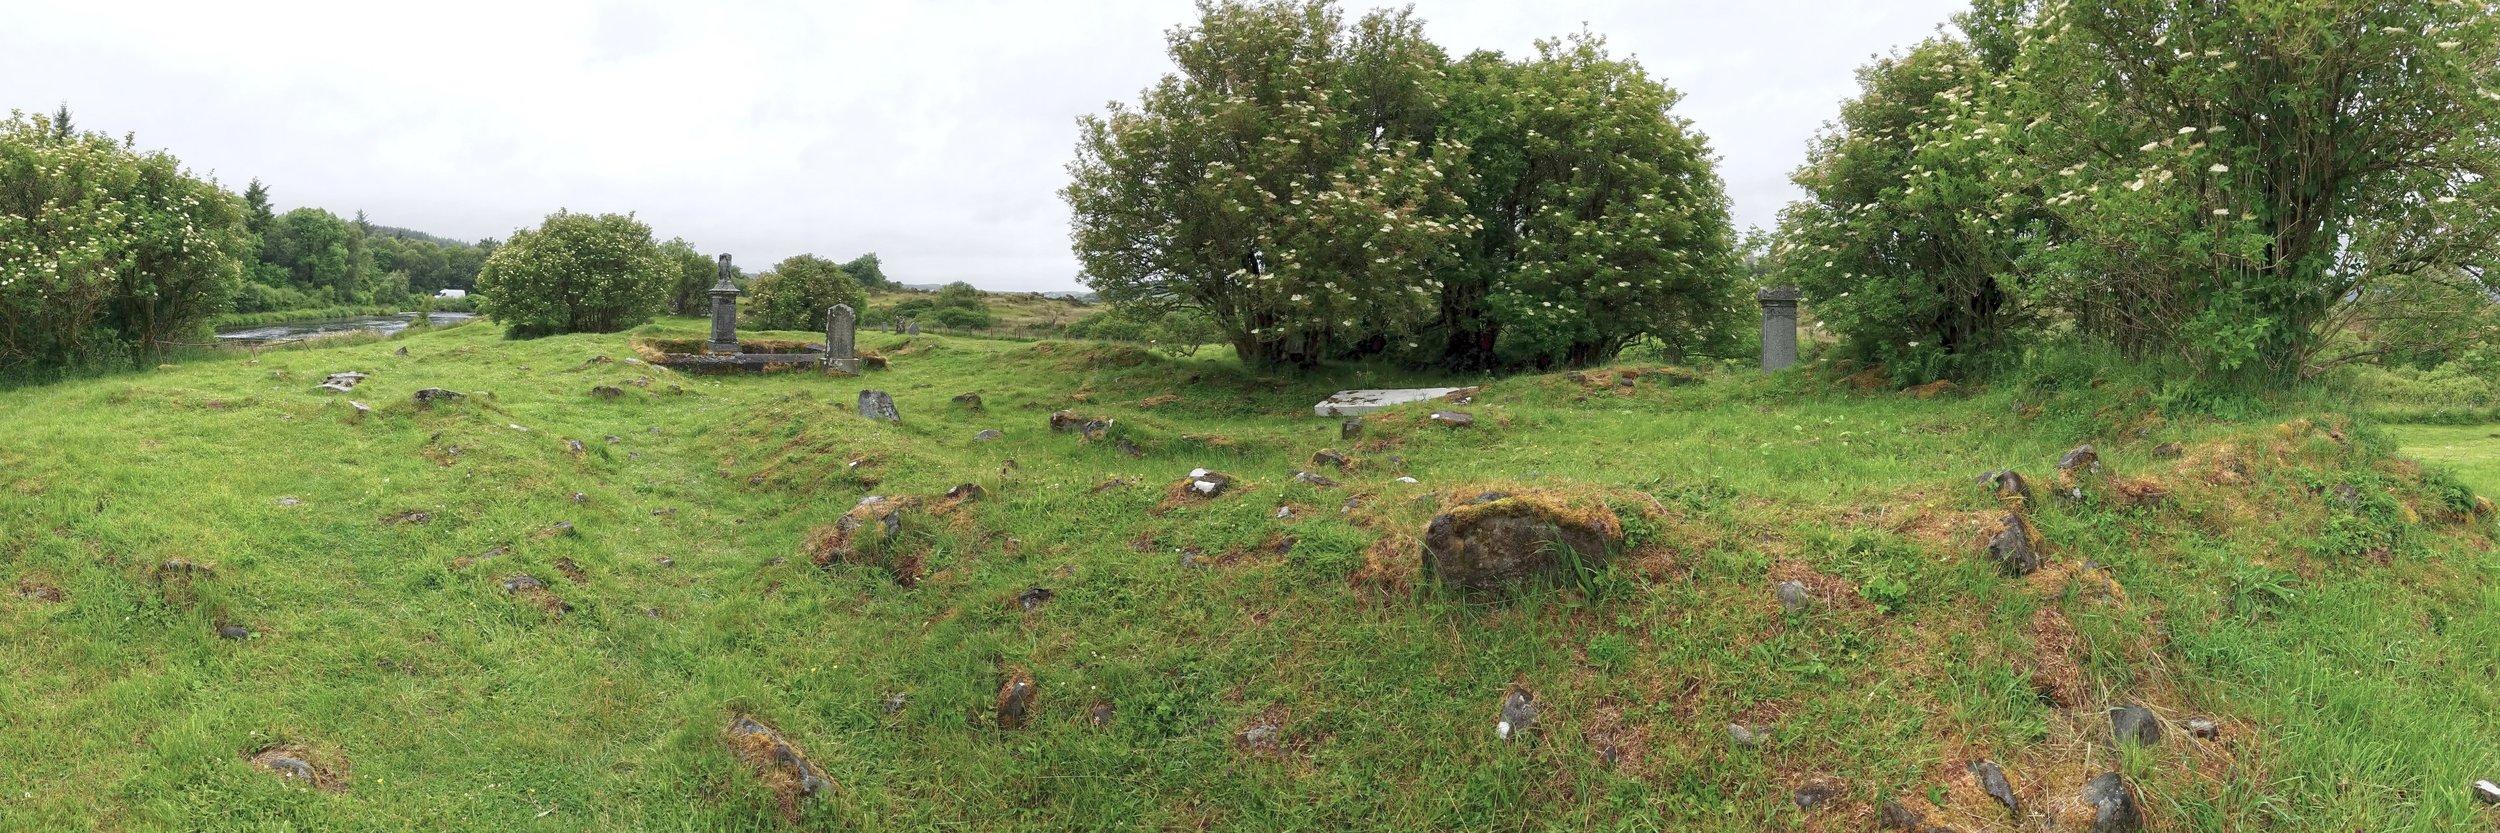 Saint Columba's Isle Panorama 2 (Custom).jpg